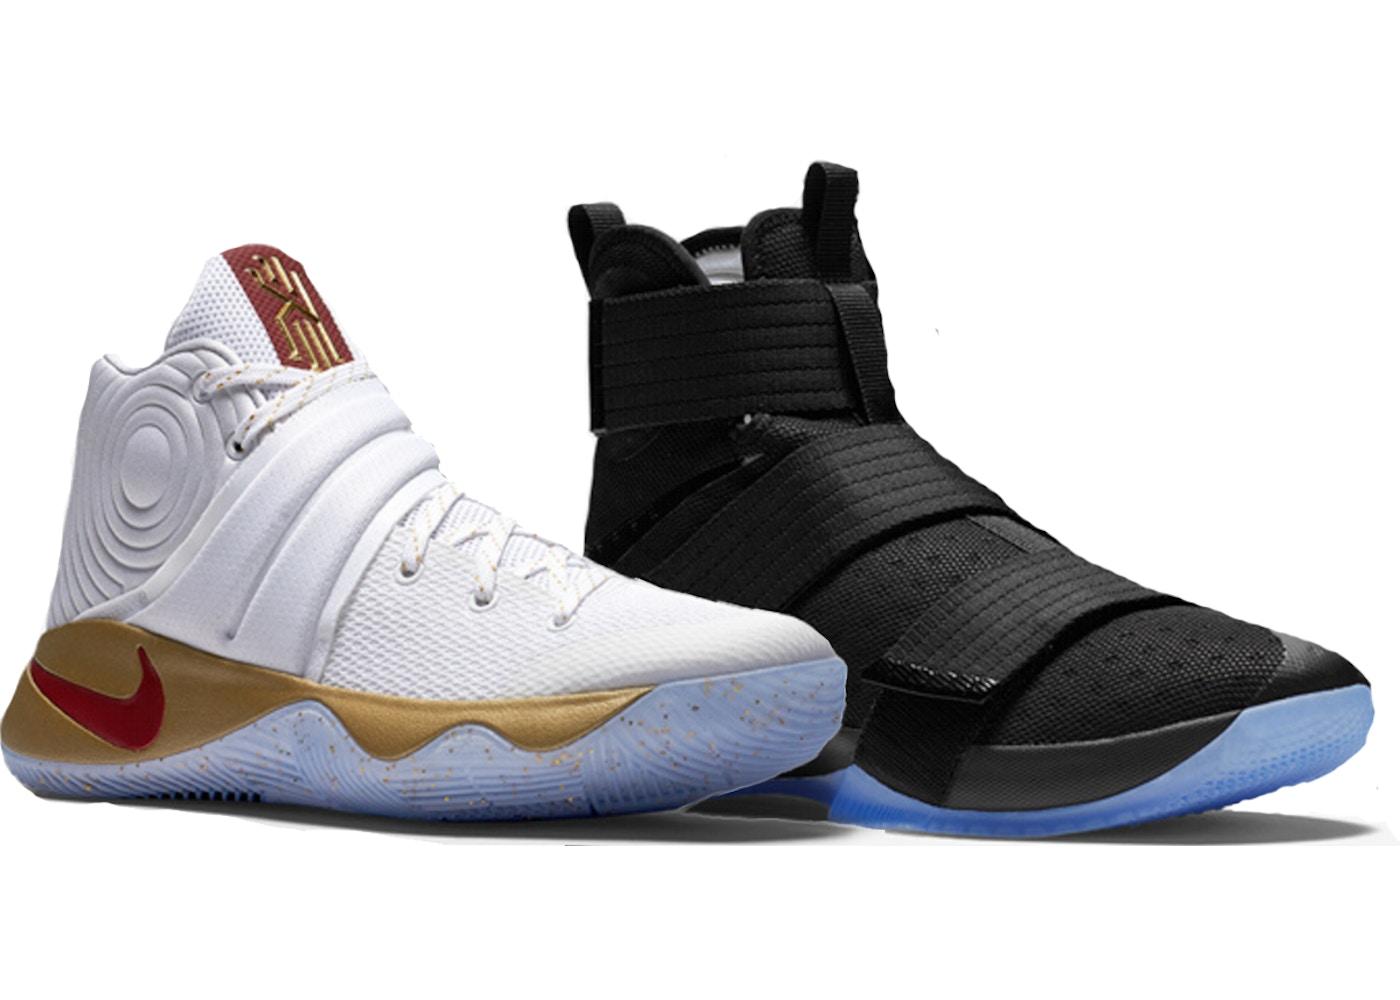 b1da85651f71 Nike Basketball LeBron Kyrie Four Wins Game 3 Homecoming Championship Pack